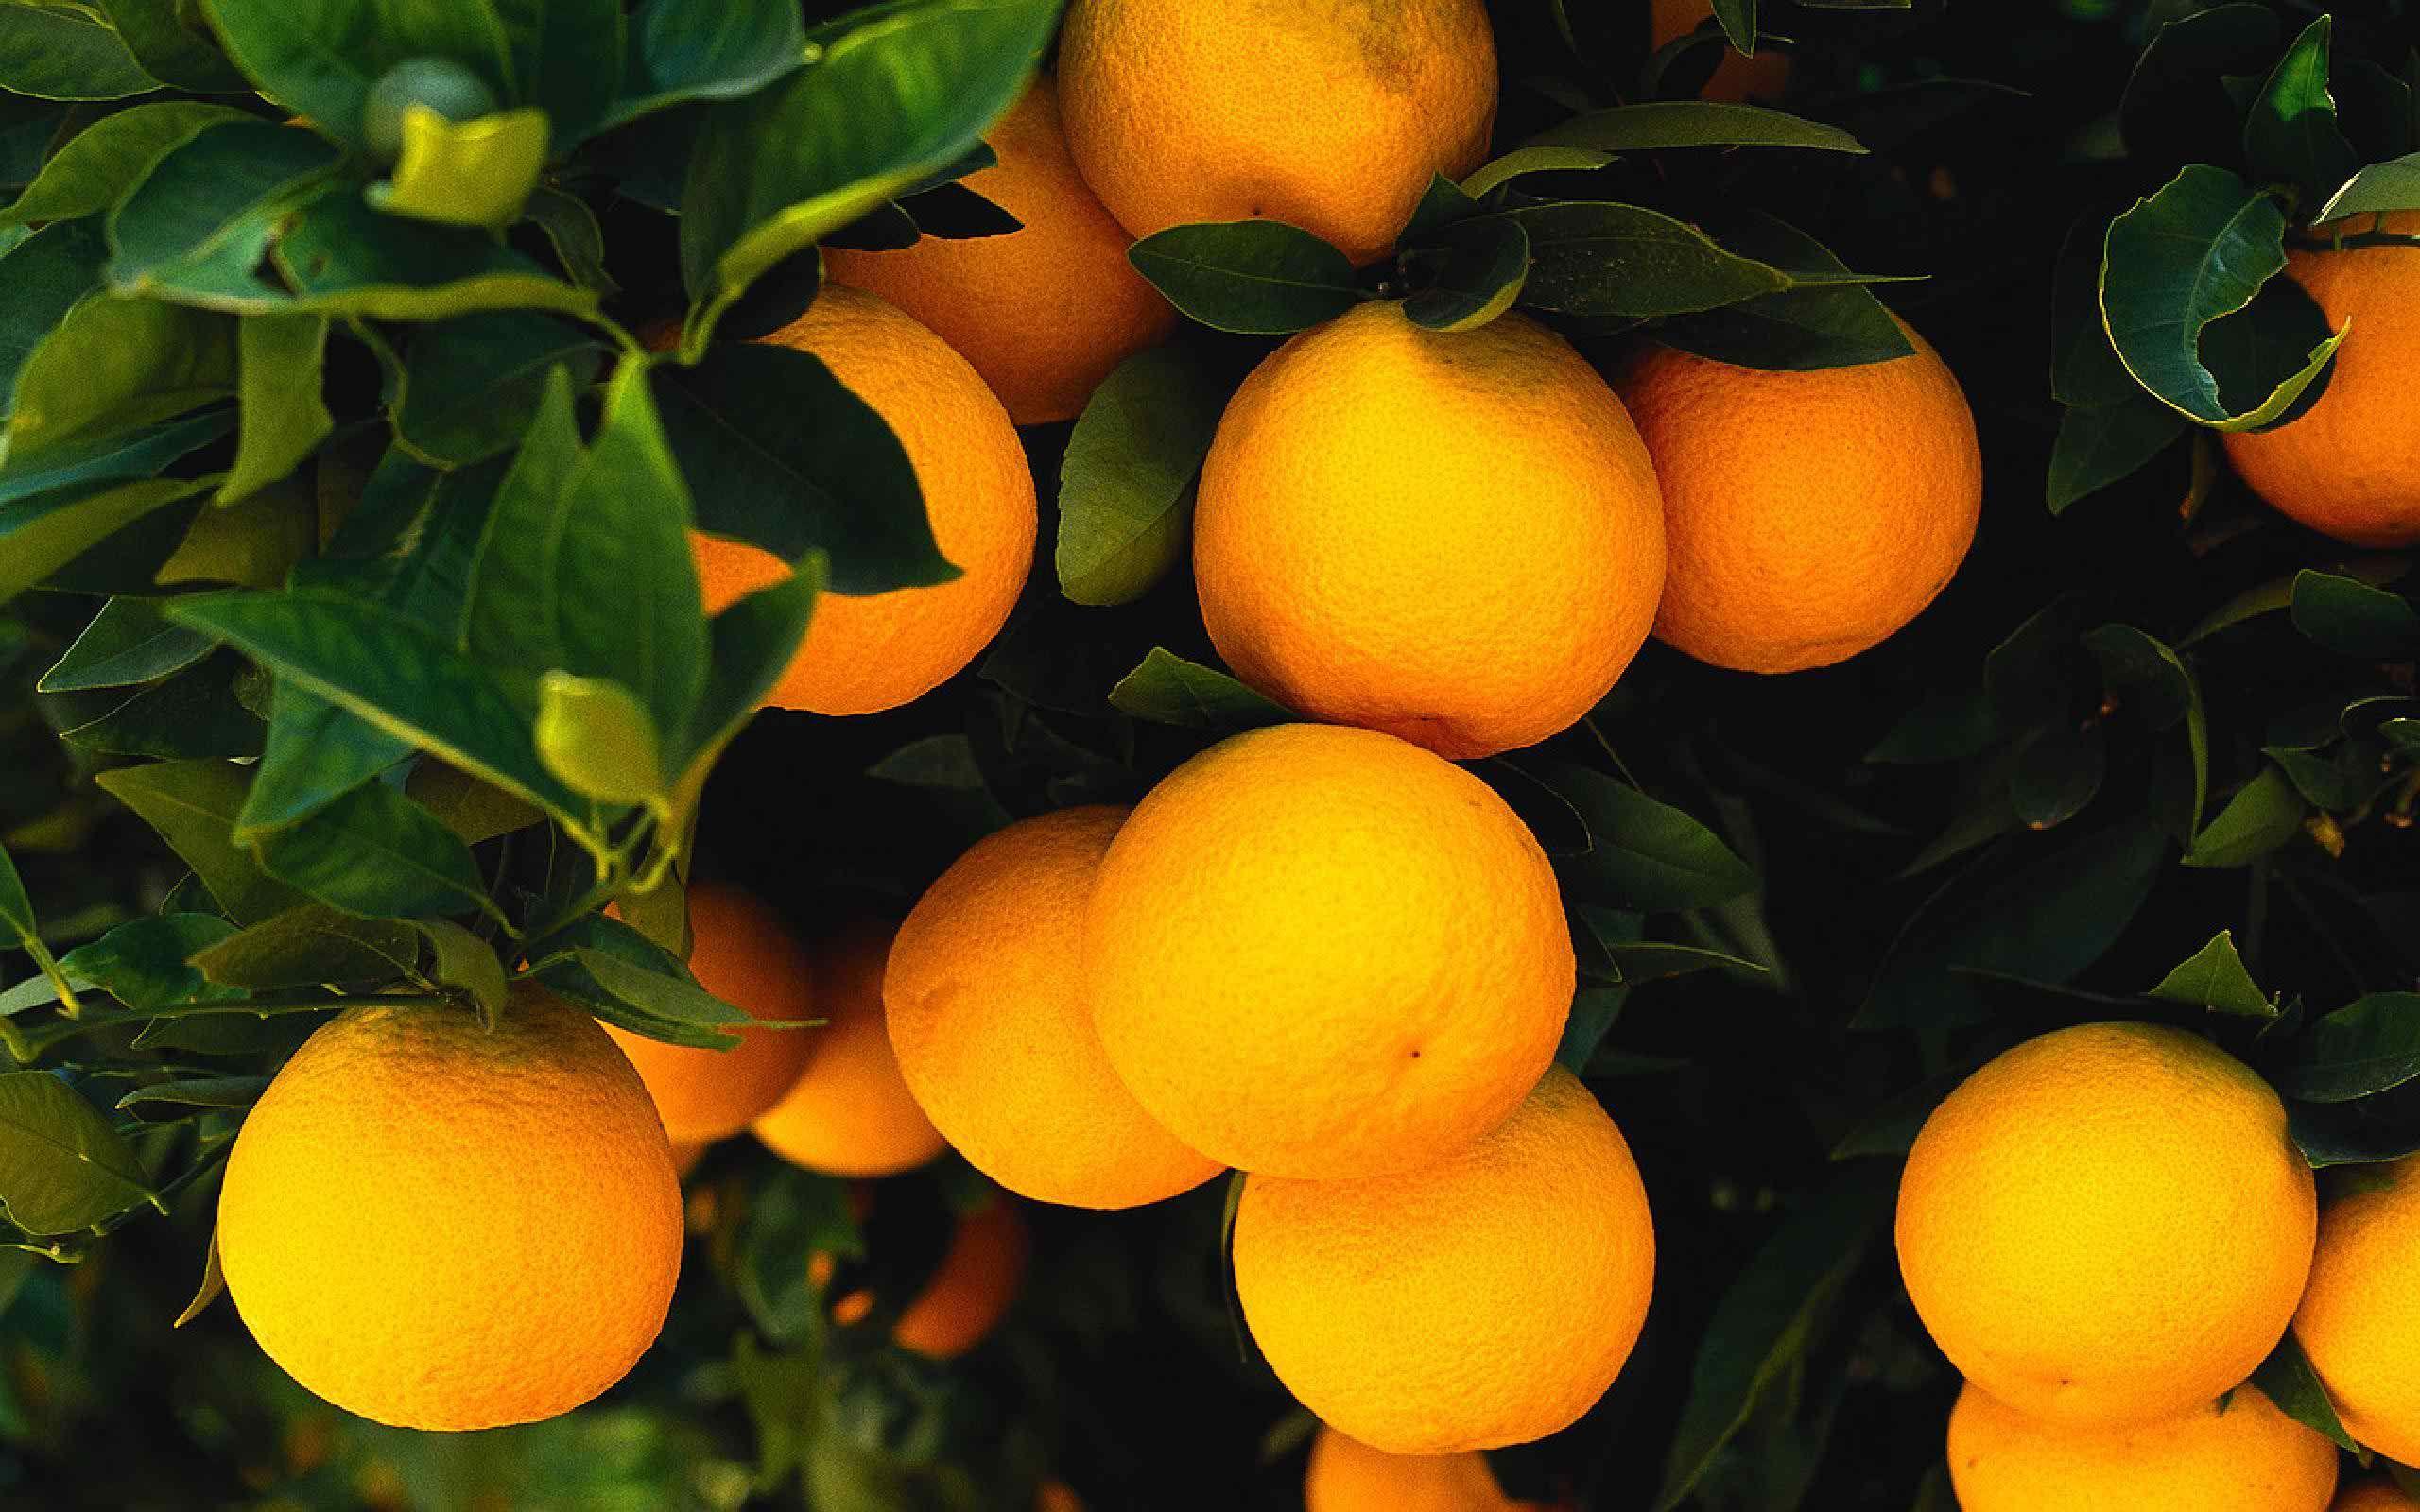 Fruit Tree Wallpaper Desktop Orange Fruit Citrus Fruit Fruit